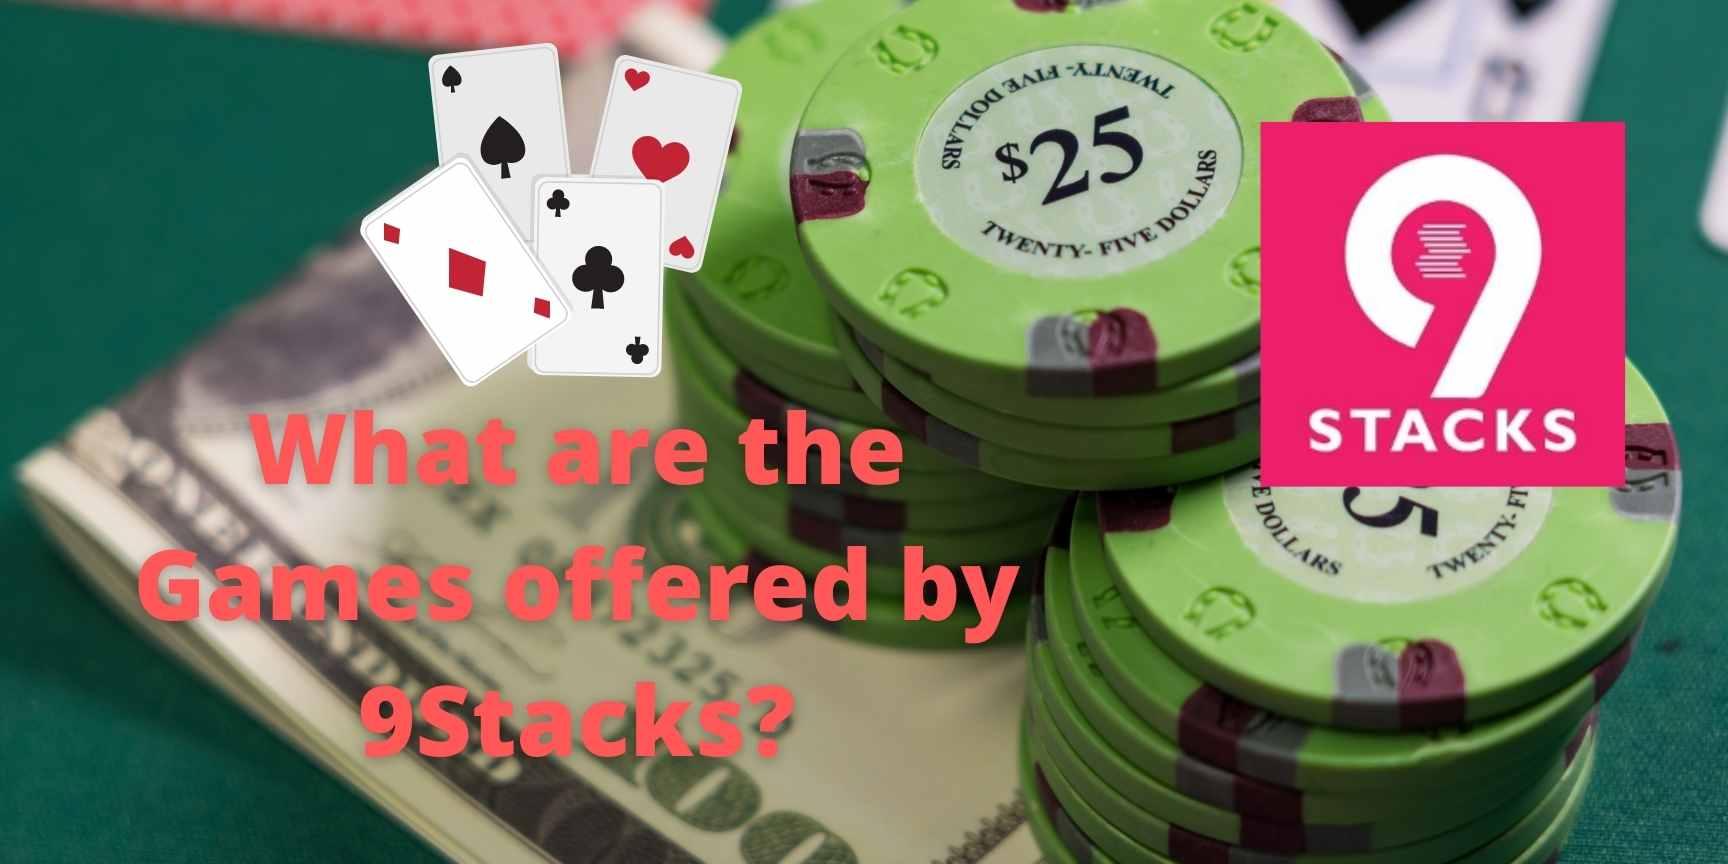 9stacks offered games